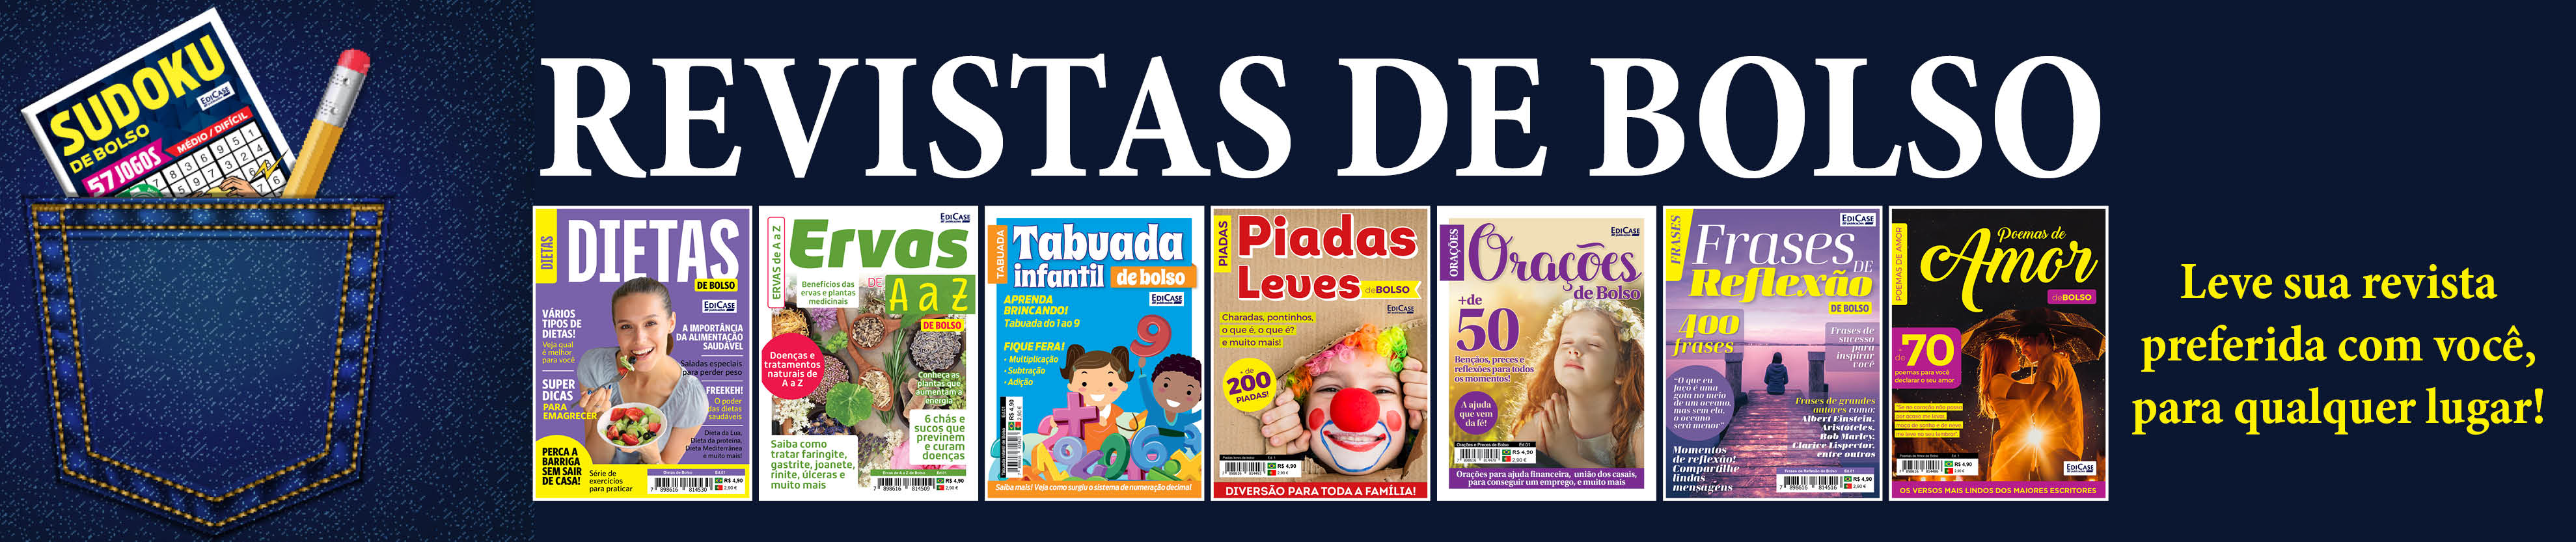 revistas de bolso